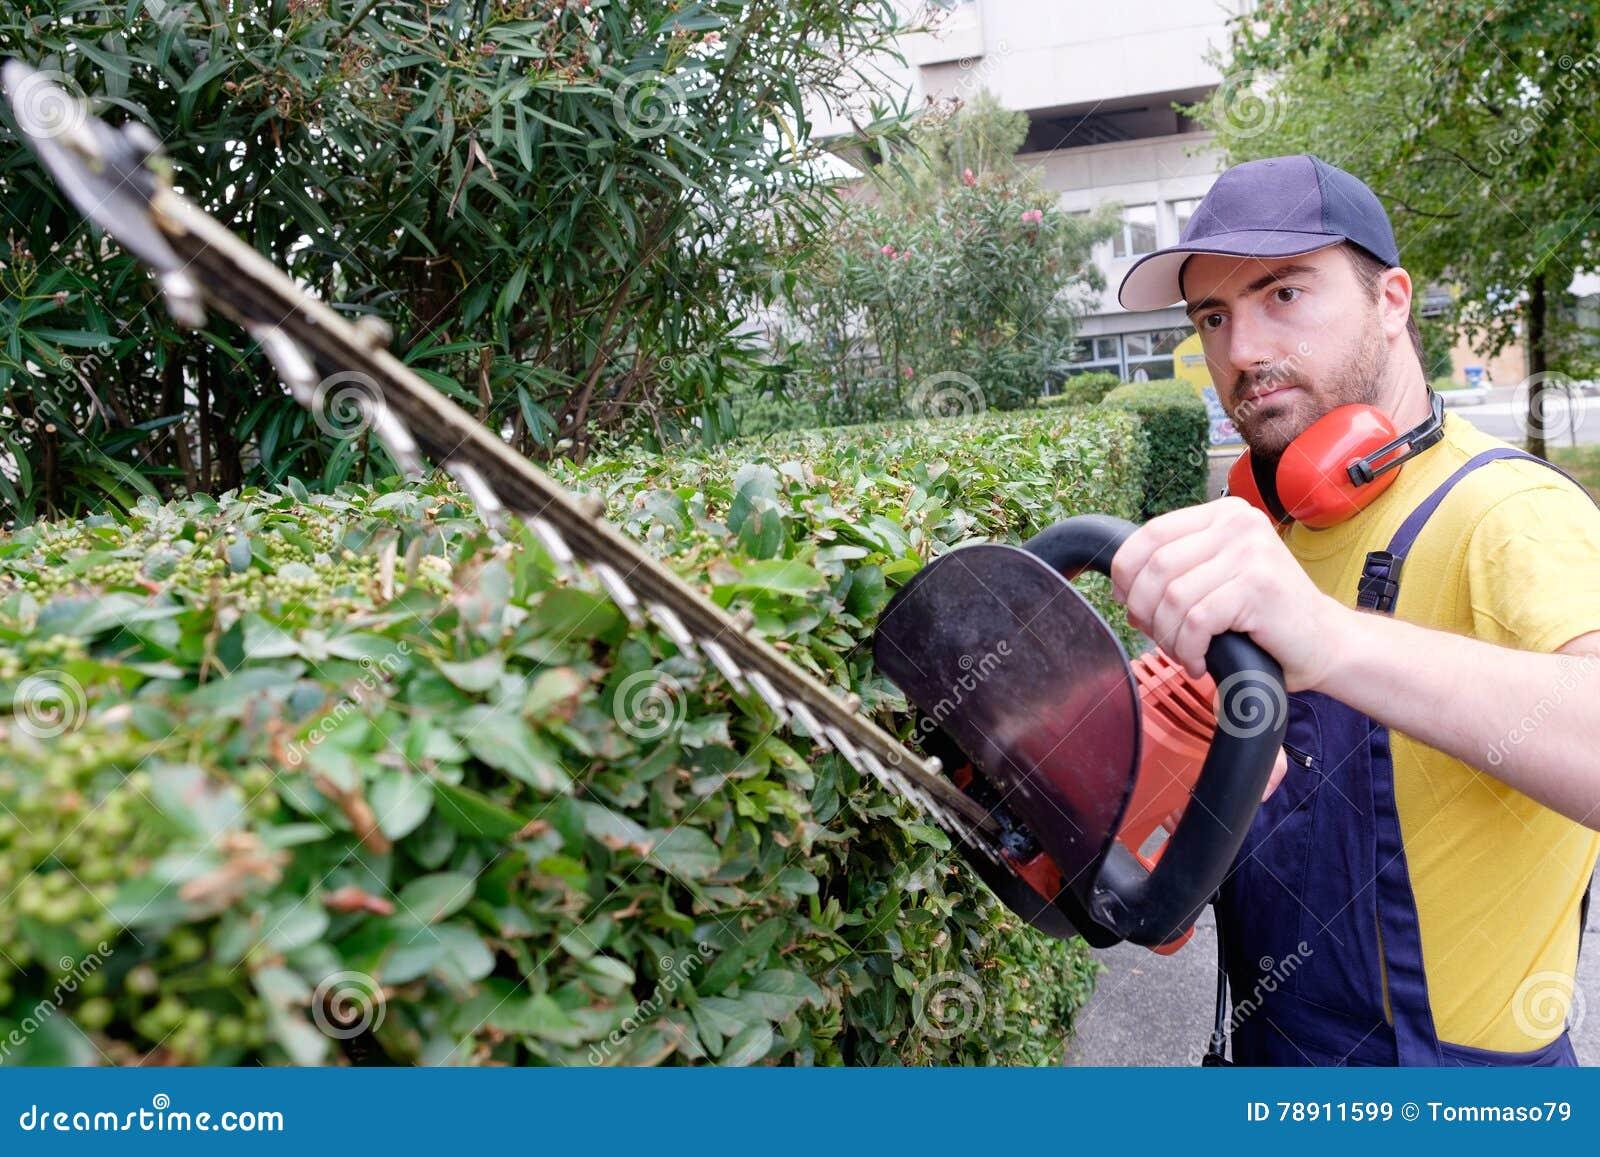 Gardener using an hedge clipper